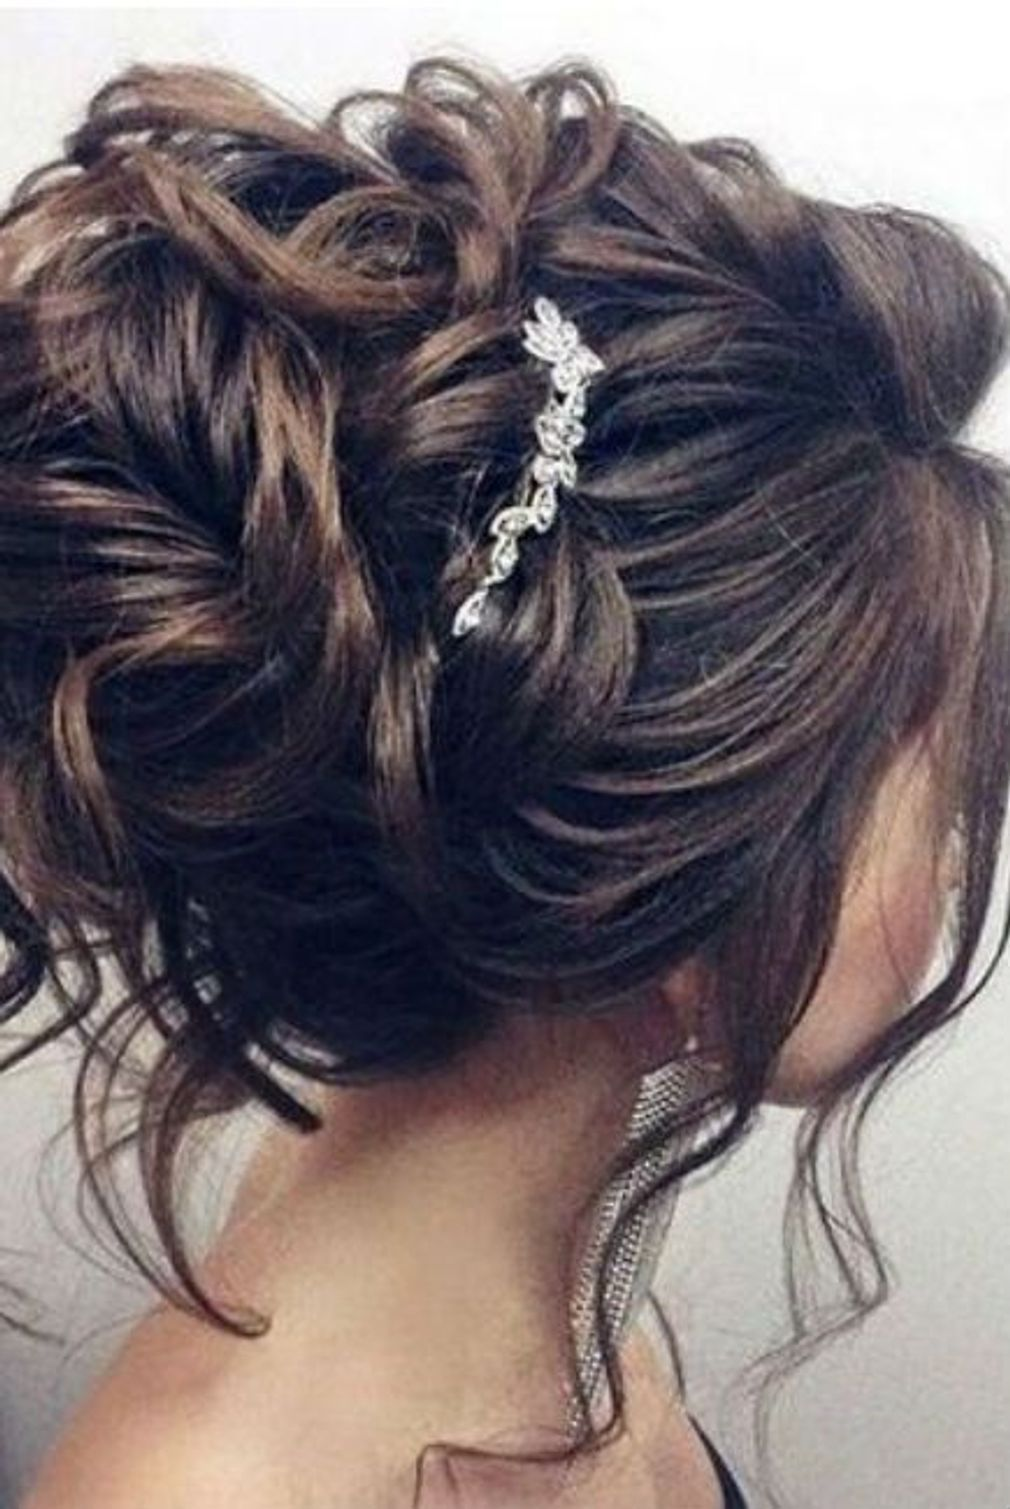 36+ Mariage coiffure chignon des idees